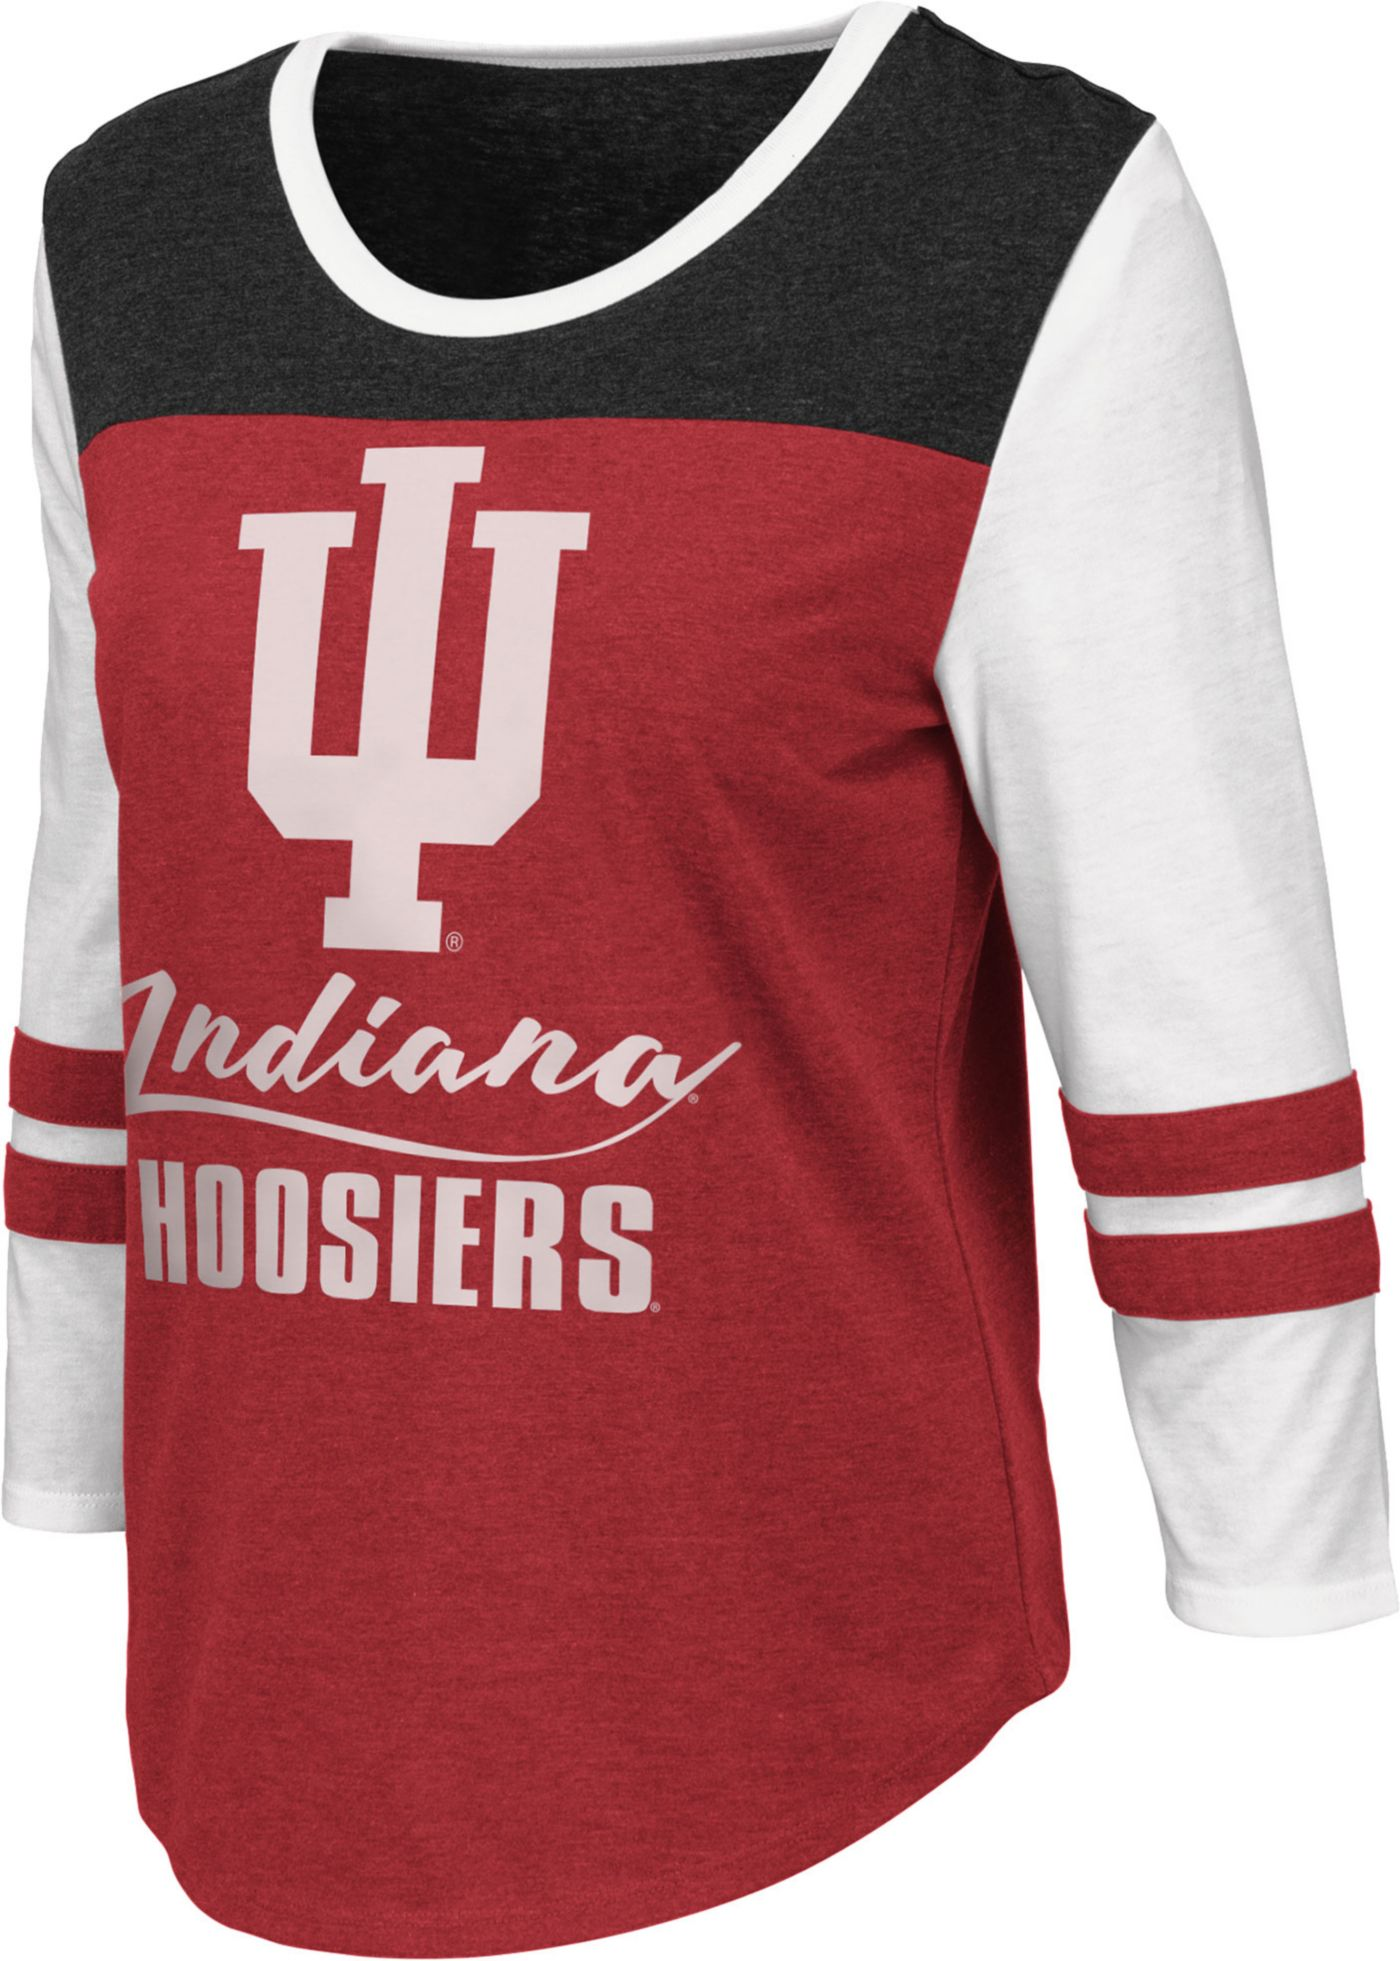 Colosseum Women's Indiana Hoosiers Crimson ¾ Sleeve Raglan T-Shirt